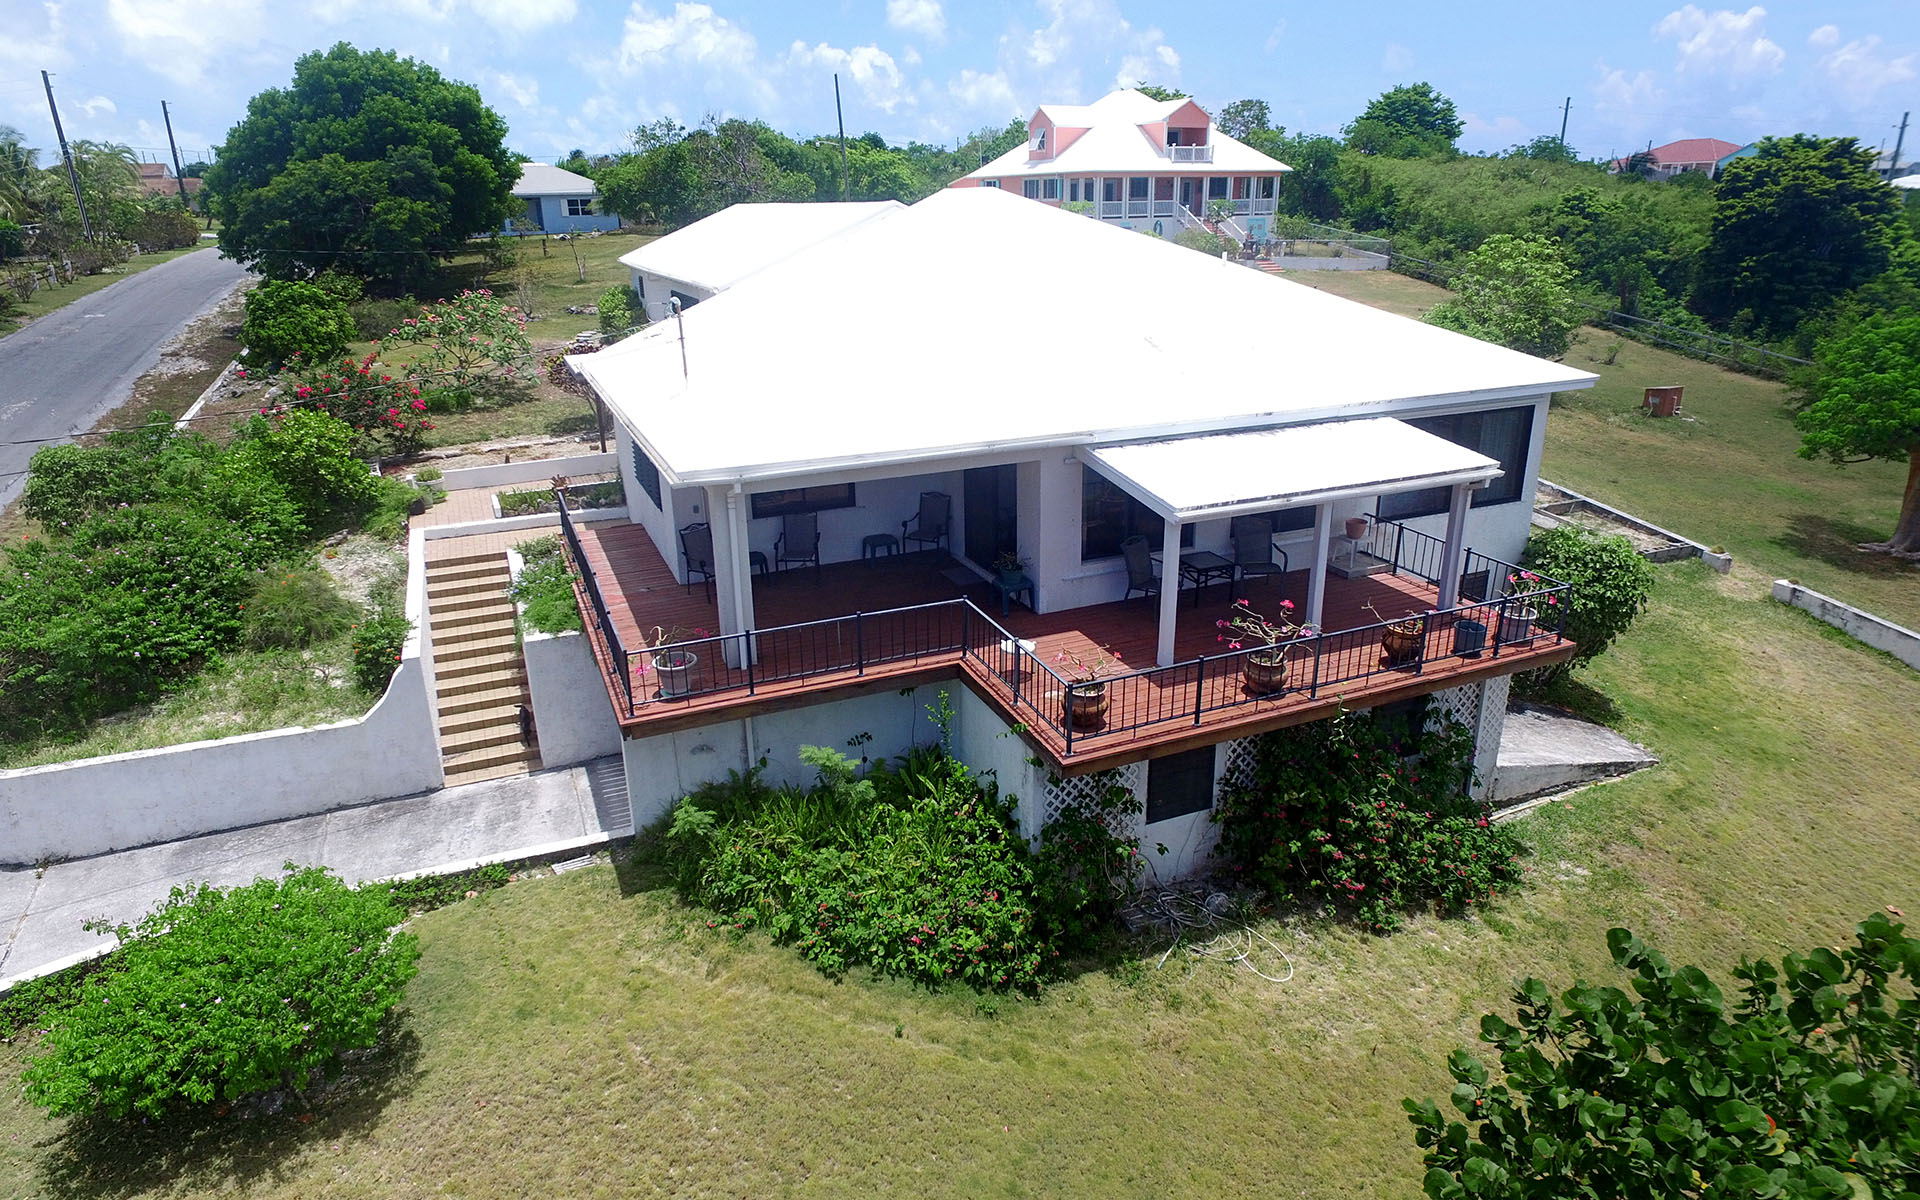 Casa Unifamiliar por un Venta en Russell Island Home With Sea View and Beach Access Russell Island, Eleuthera, Bahamas